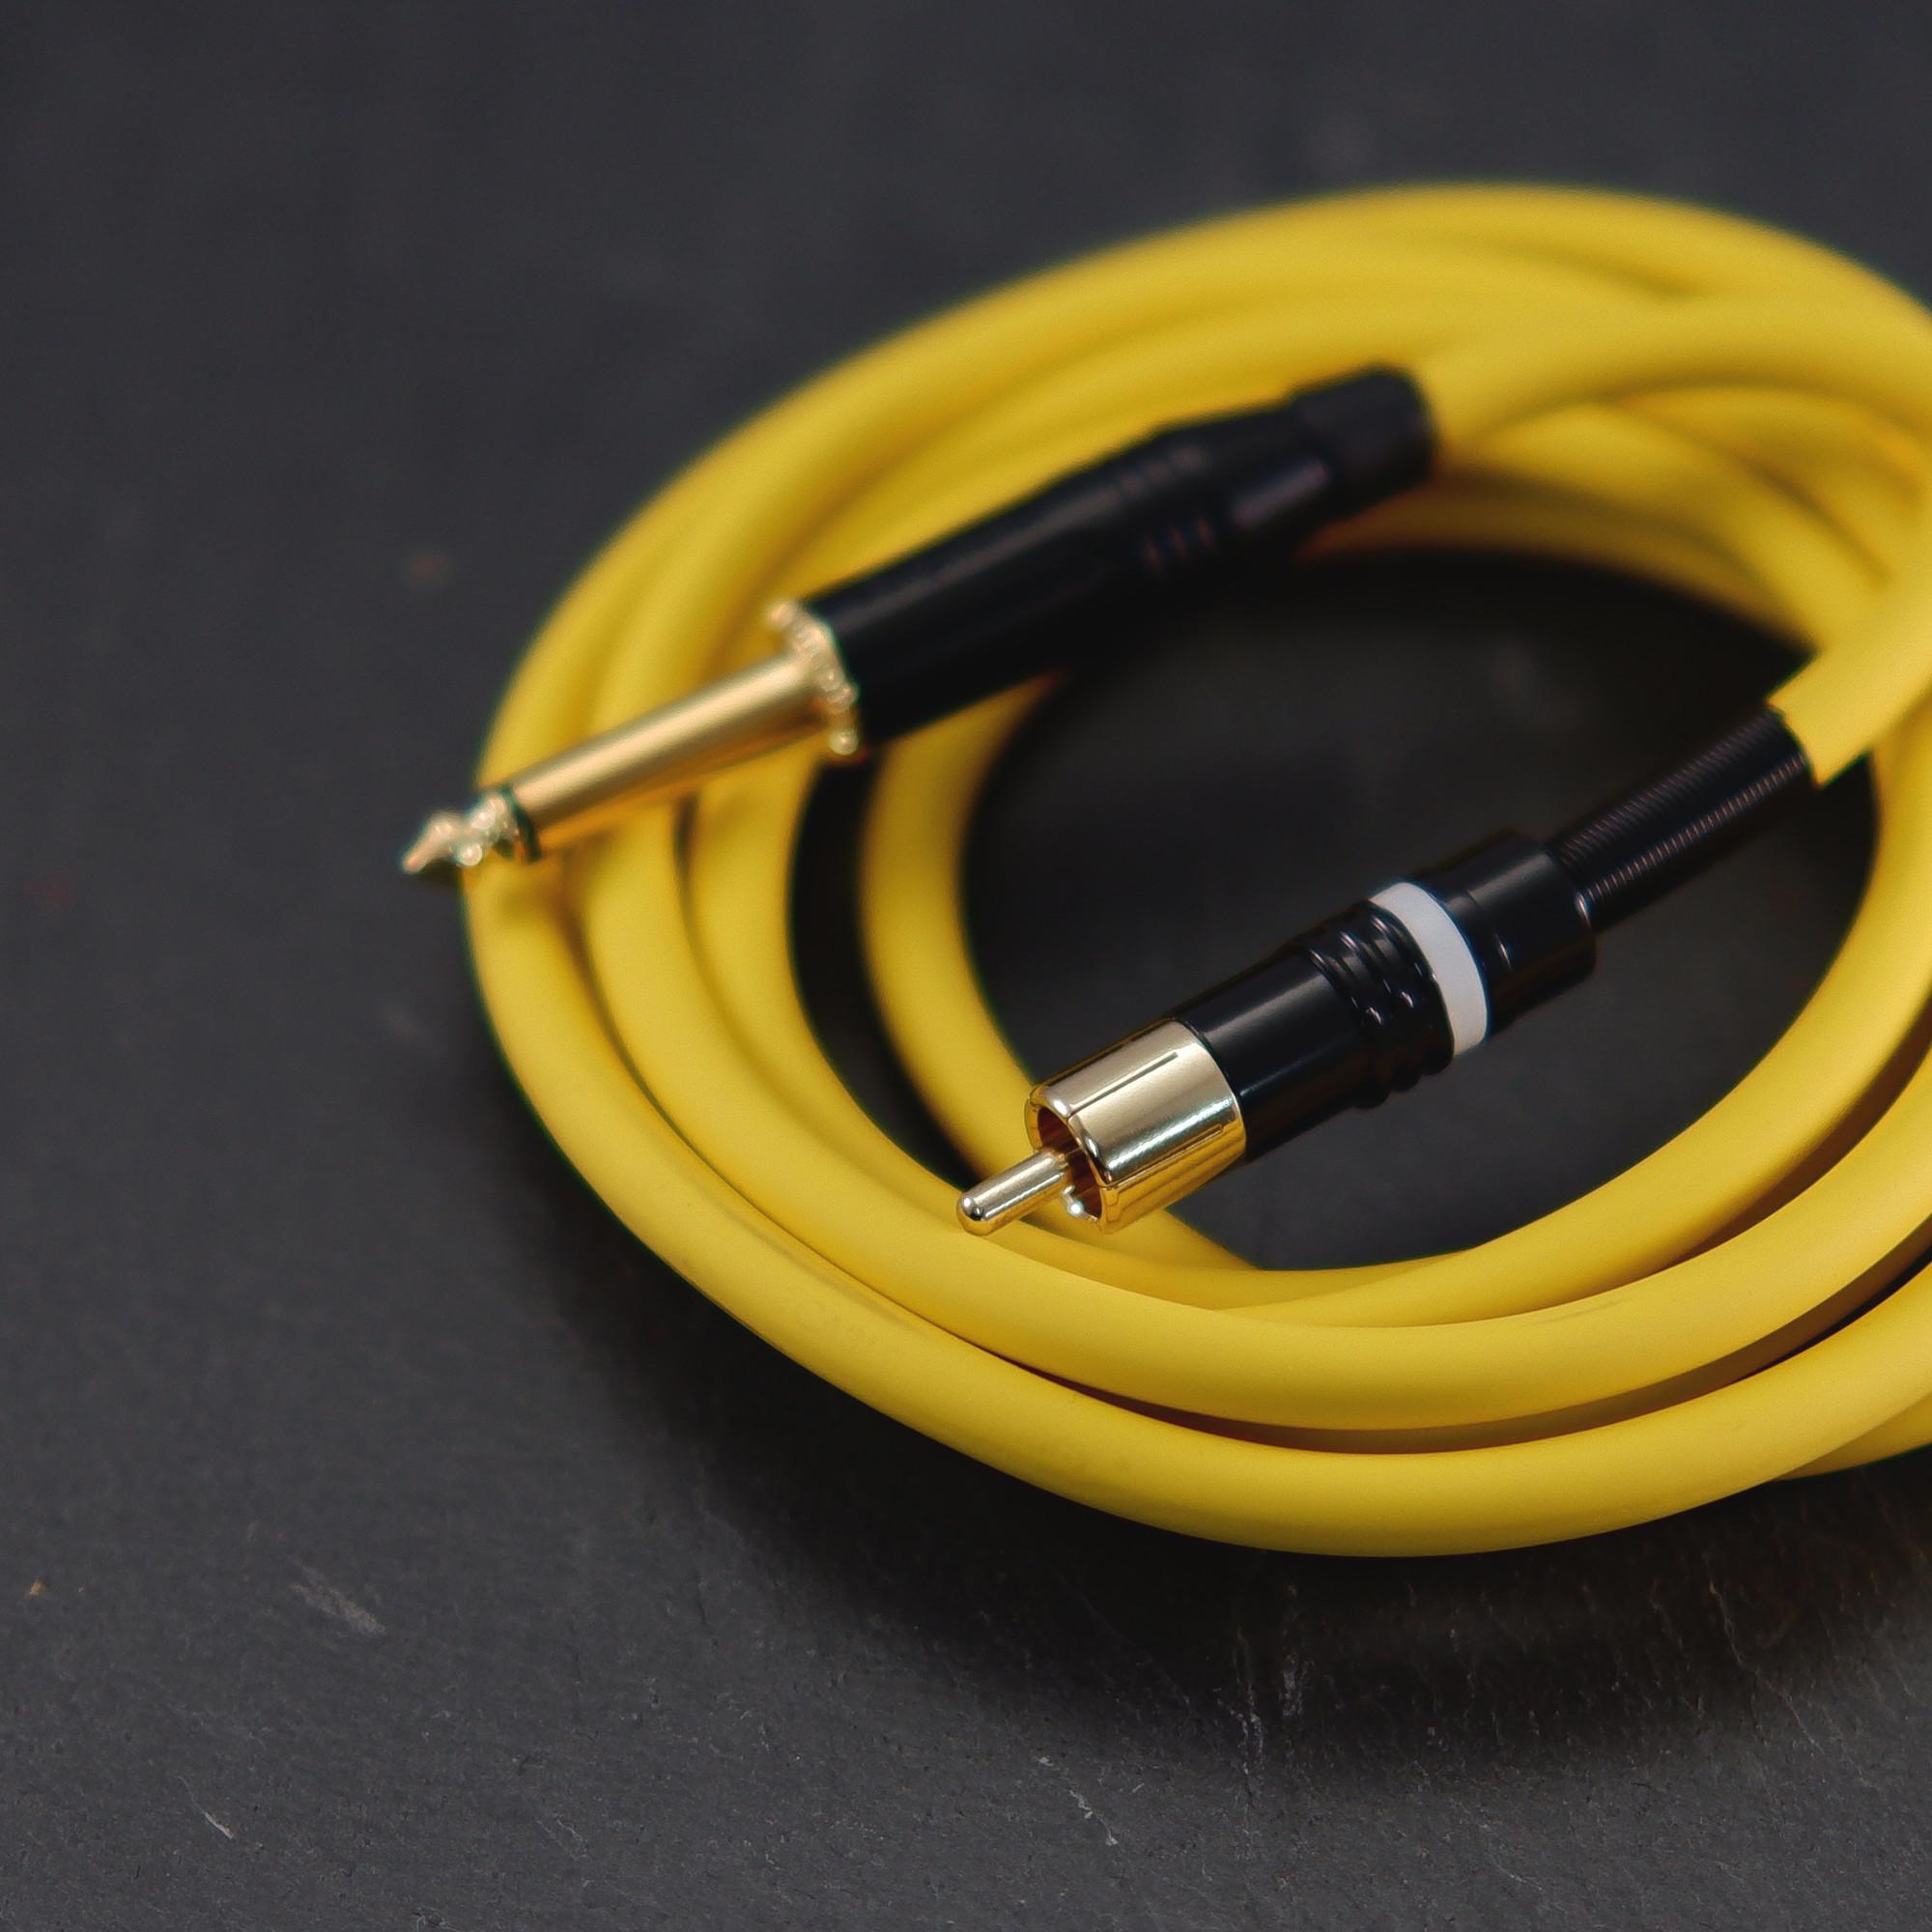 Premium Yellow Heavy Duty RCA Cable